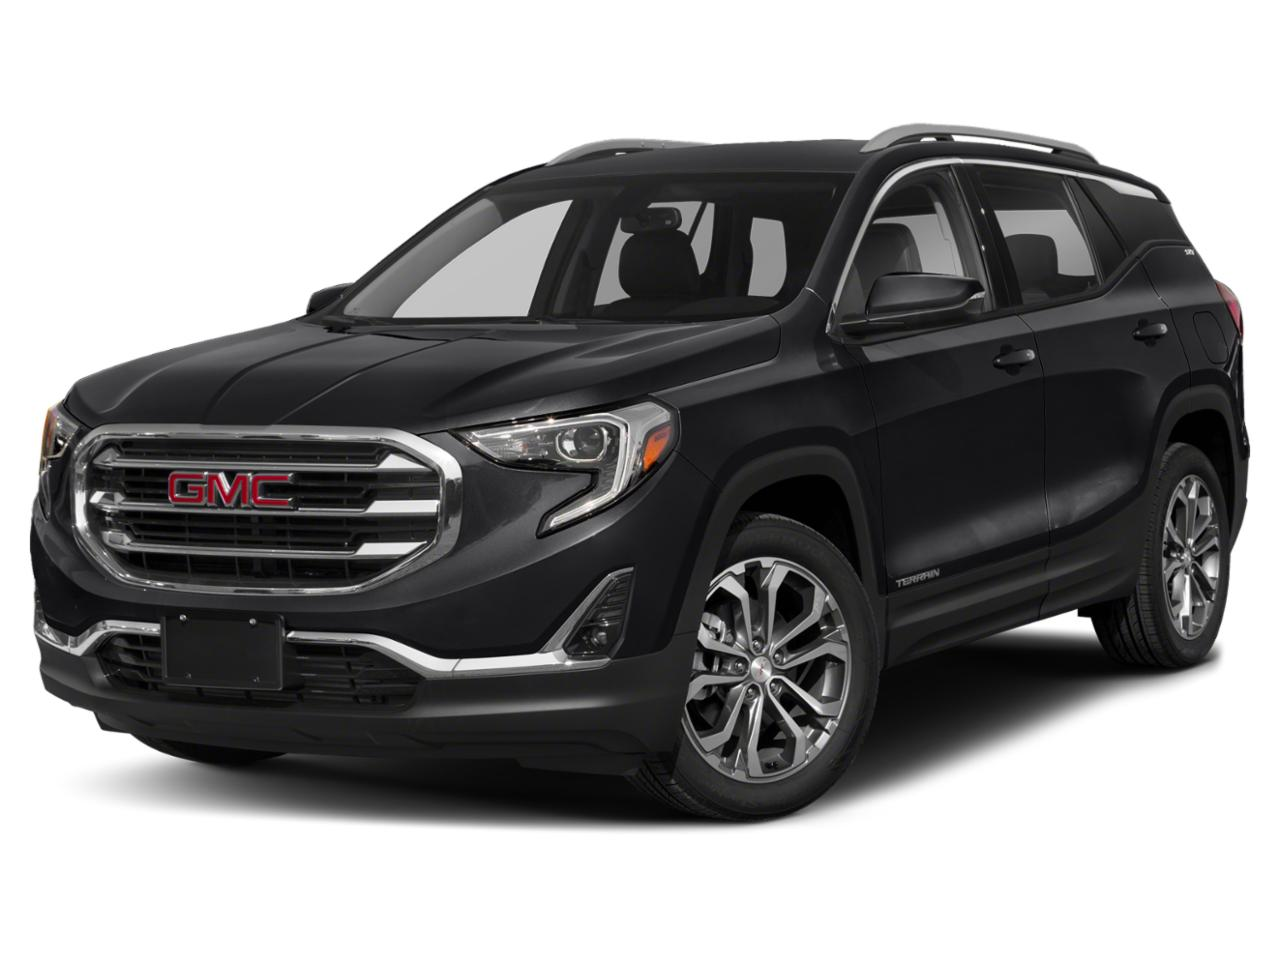 Used Gmc Terrain Vehicles For Sale In Big Rapids Mi Betten Baker Chevrolet Buick Gmc